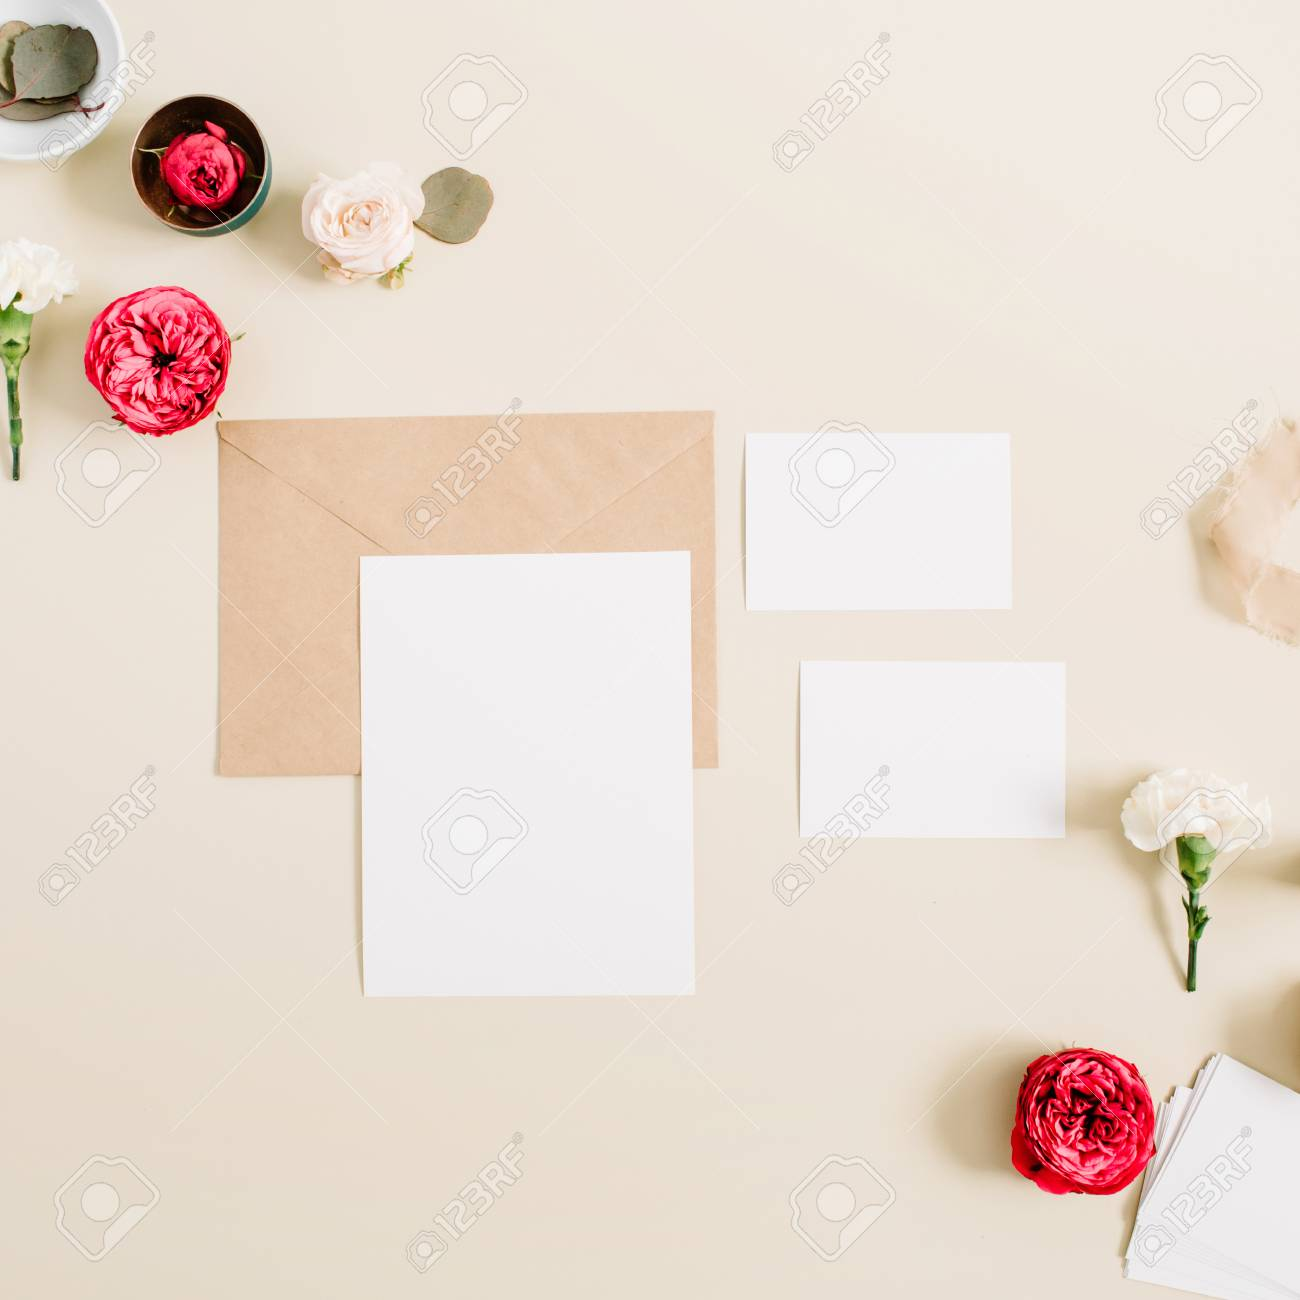 Wedding Invitation Cards, Craft Envelope, Pink And Red Rose Flower ...